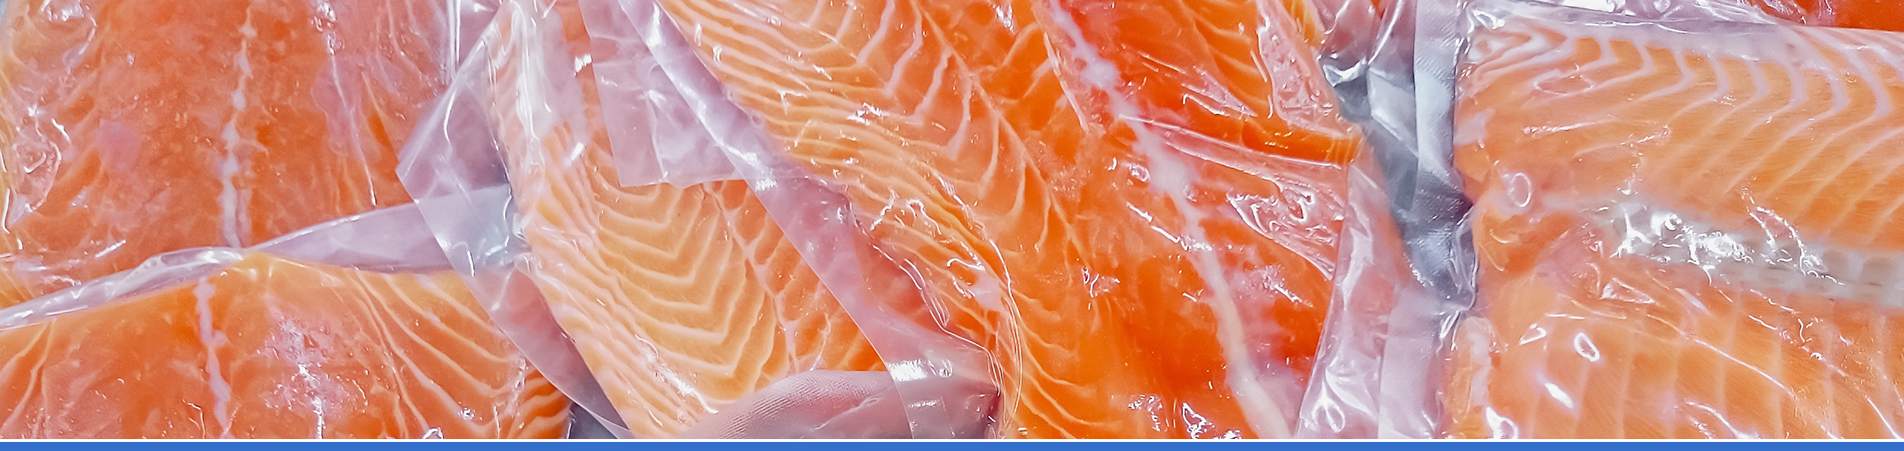 Emme Gel distribuzione surgelati - pesce surgelato